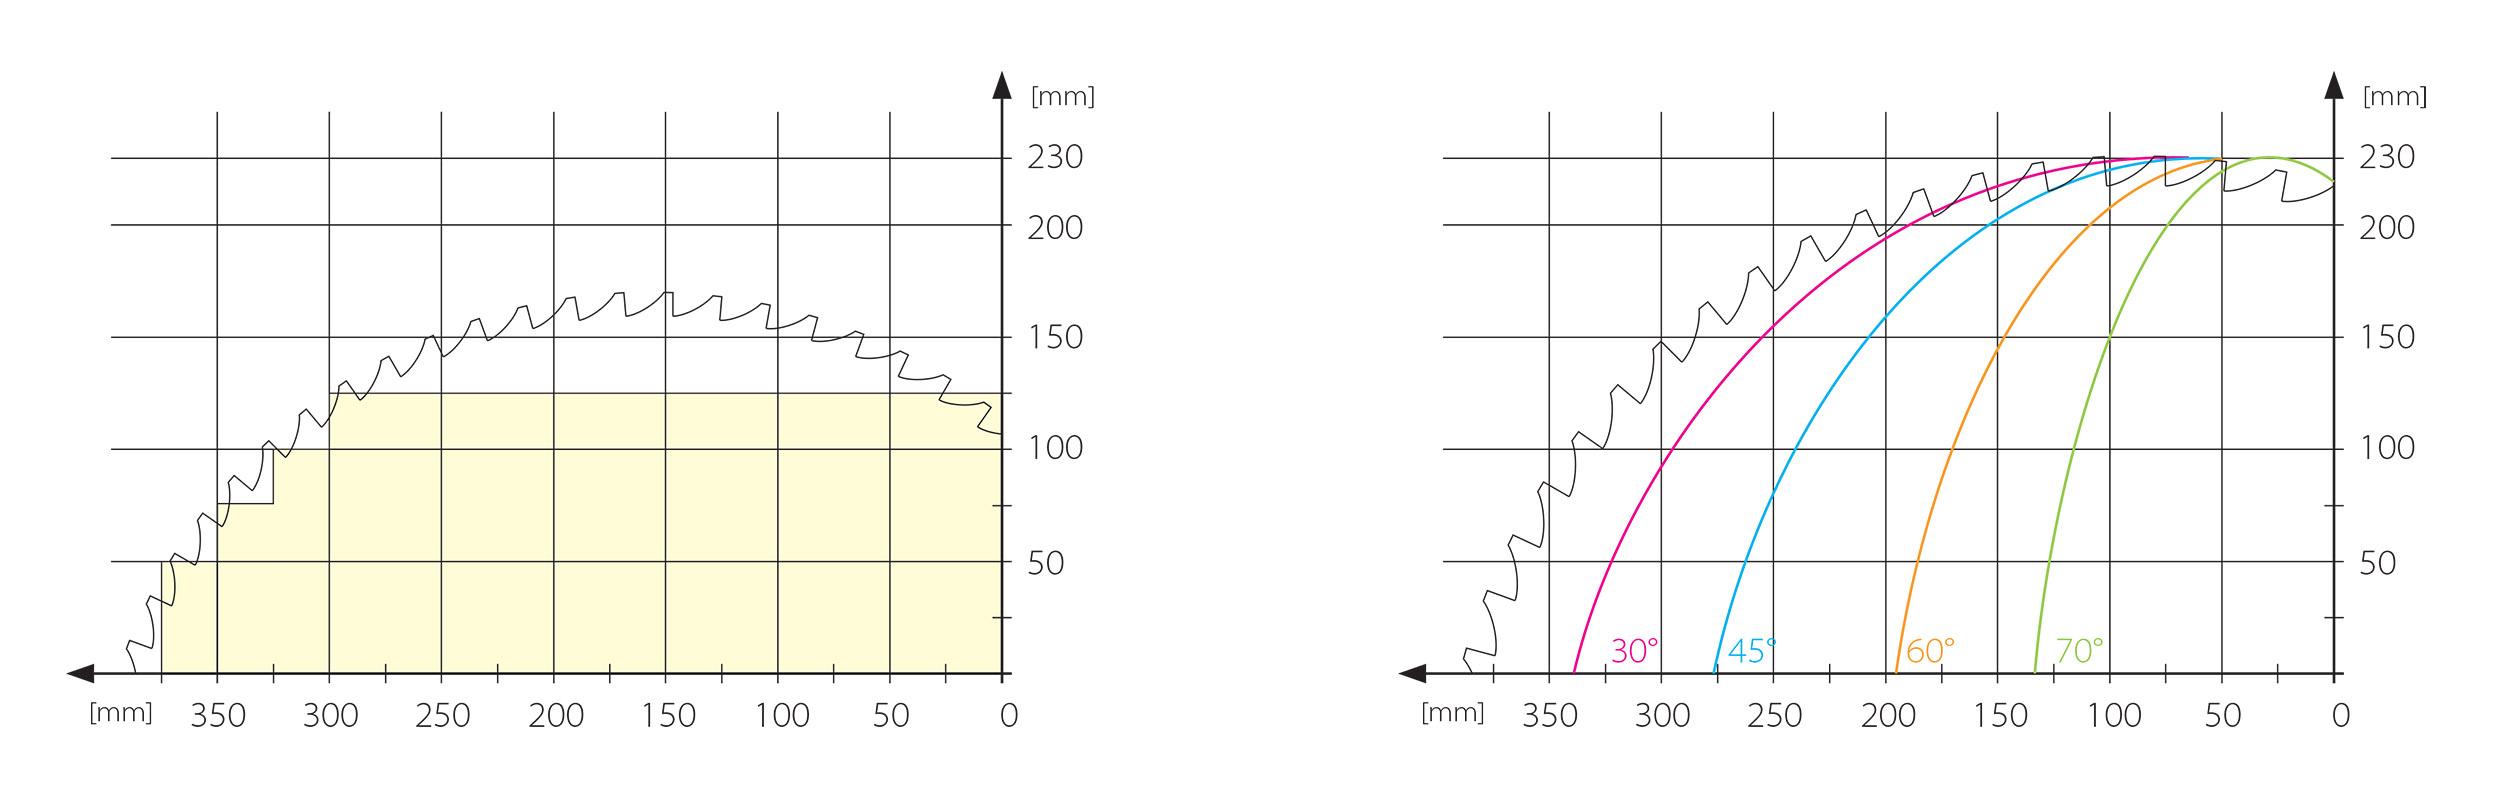 Sawblade Cutting Diagram for CROSSLINE Automatic Crosscut Saw Series 500, 650, 650G